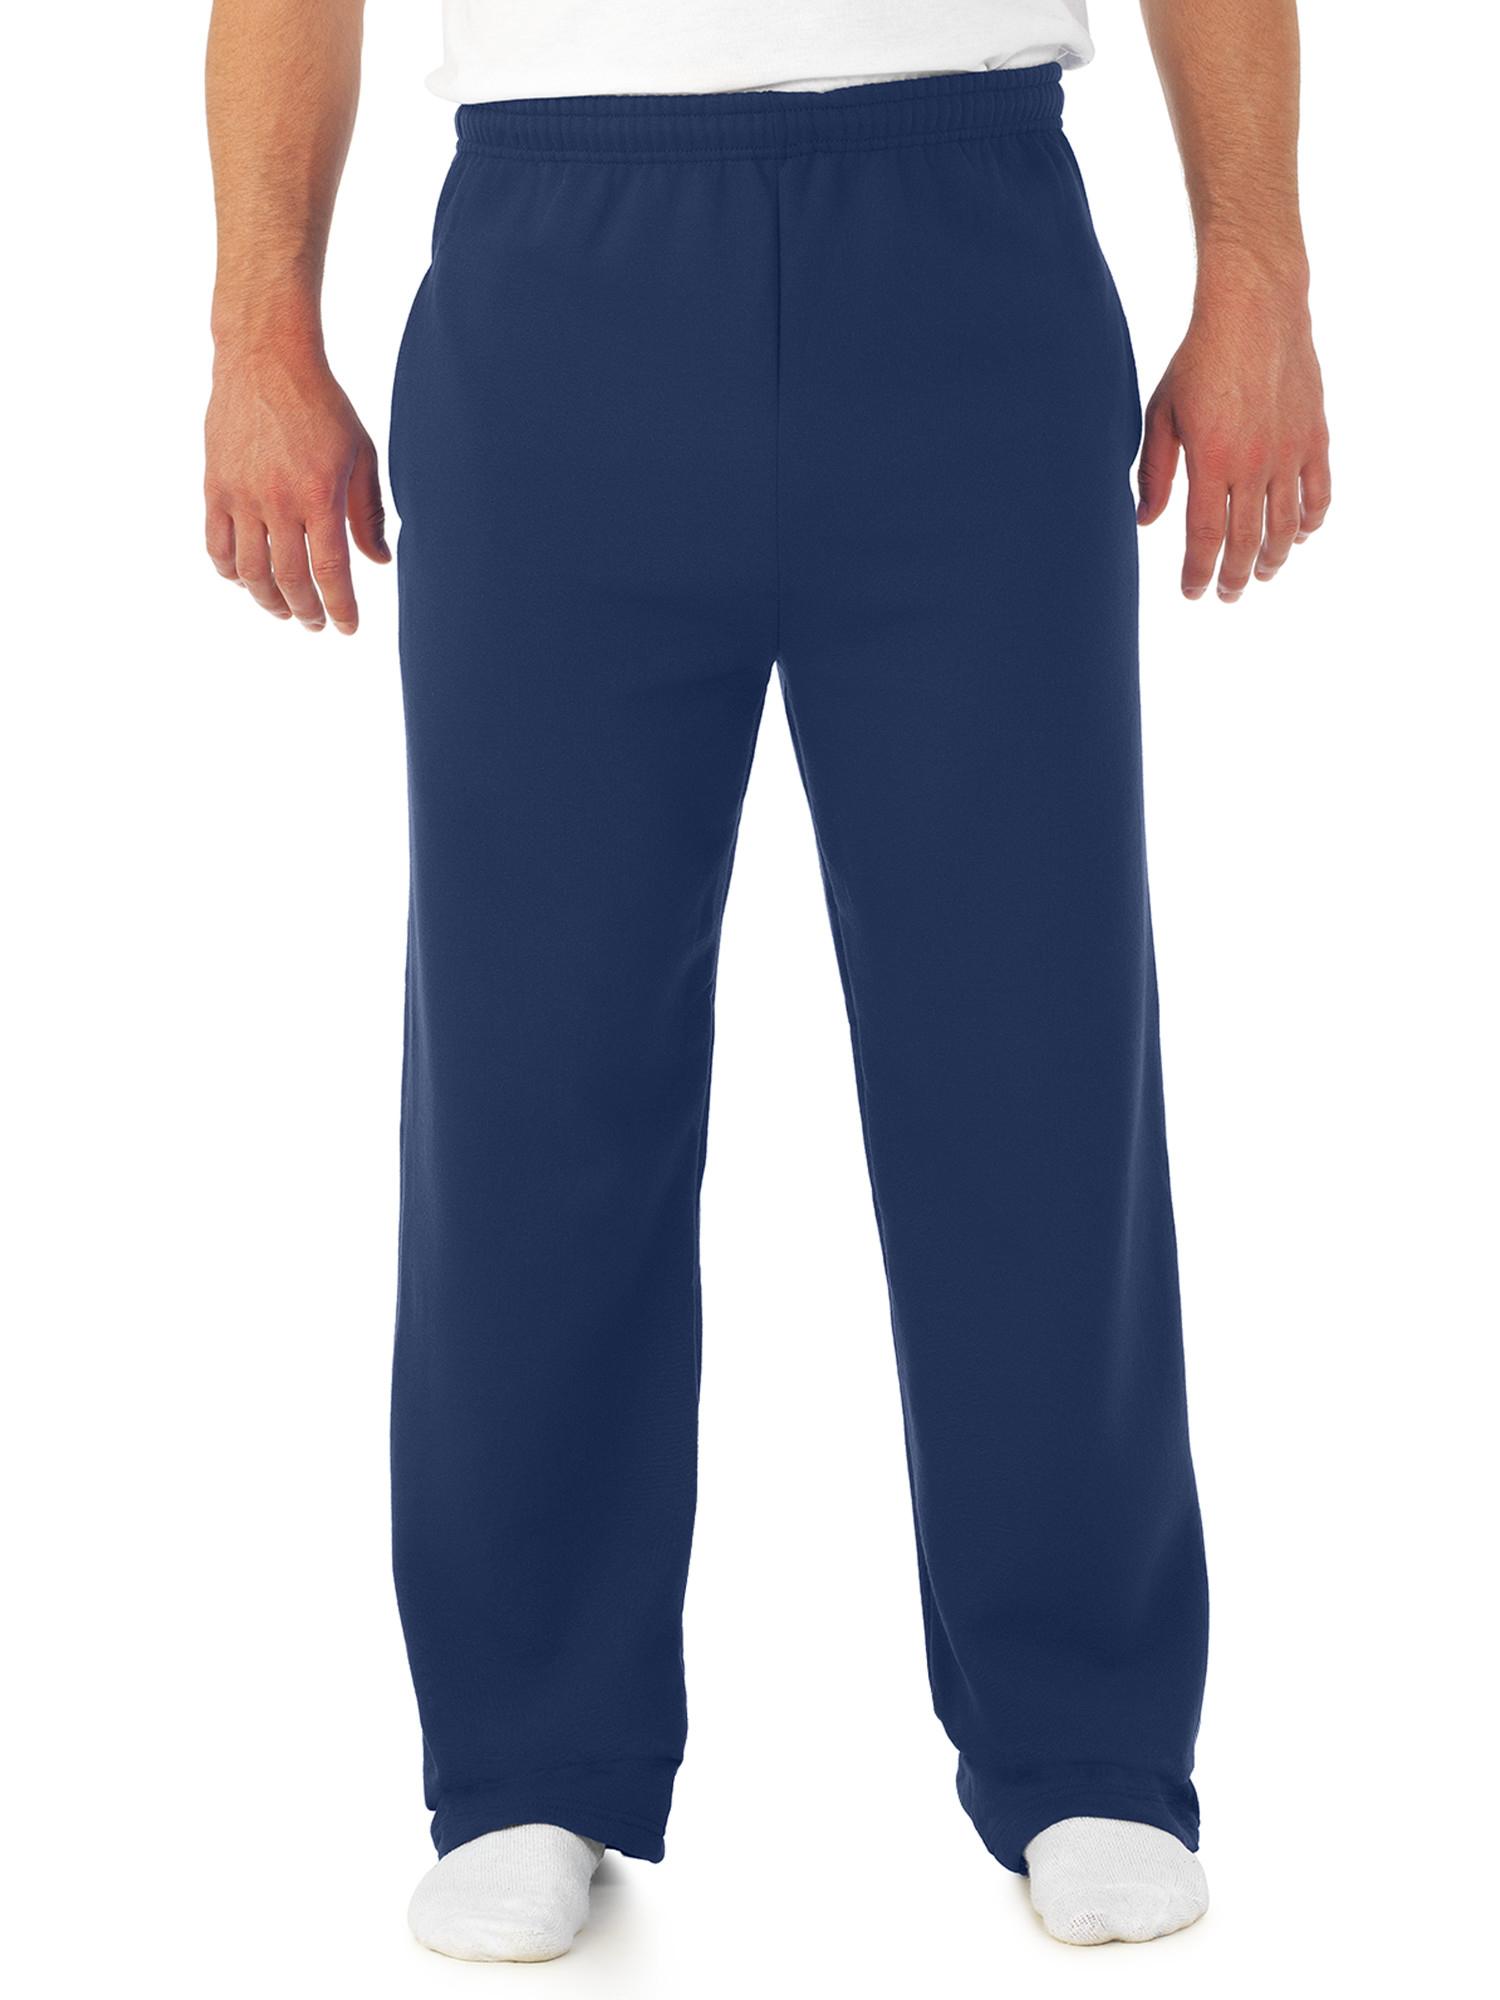 Big Men's Soft Medium-Weight Fleece Open Bottom Sweatpants, with pockets